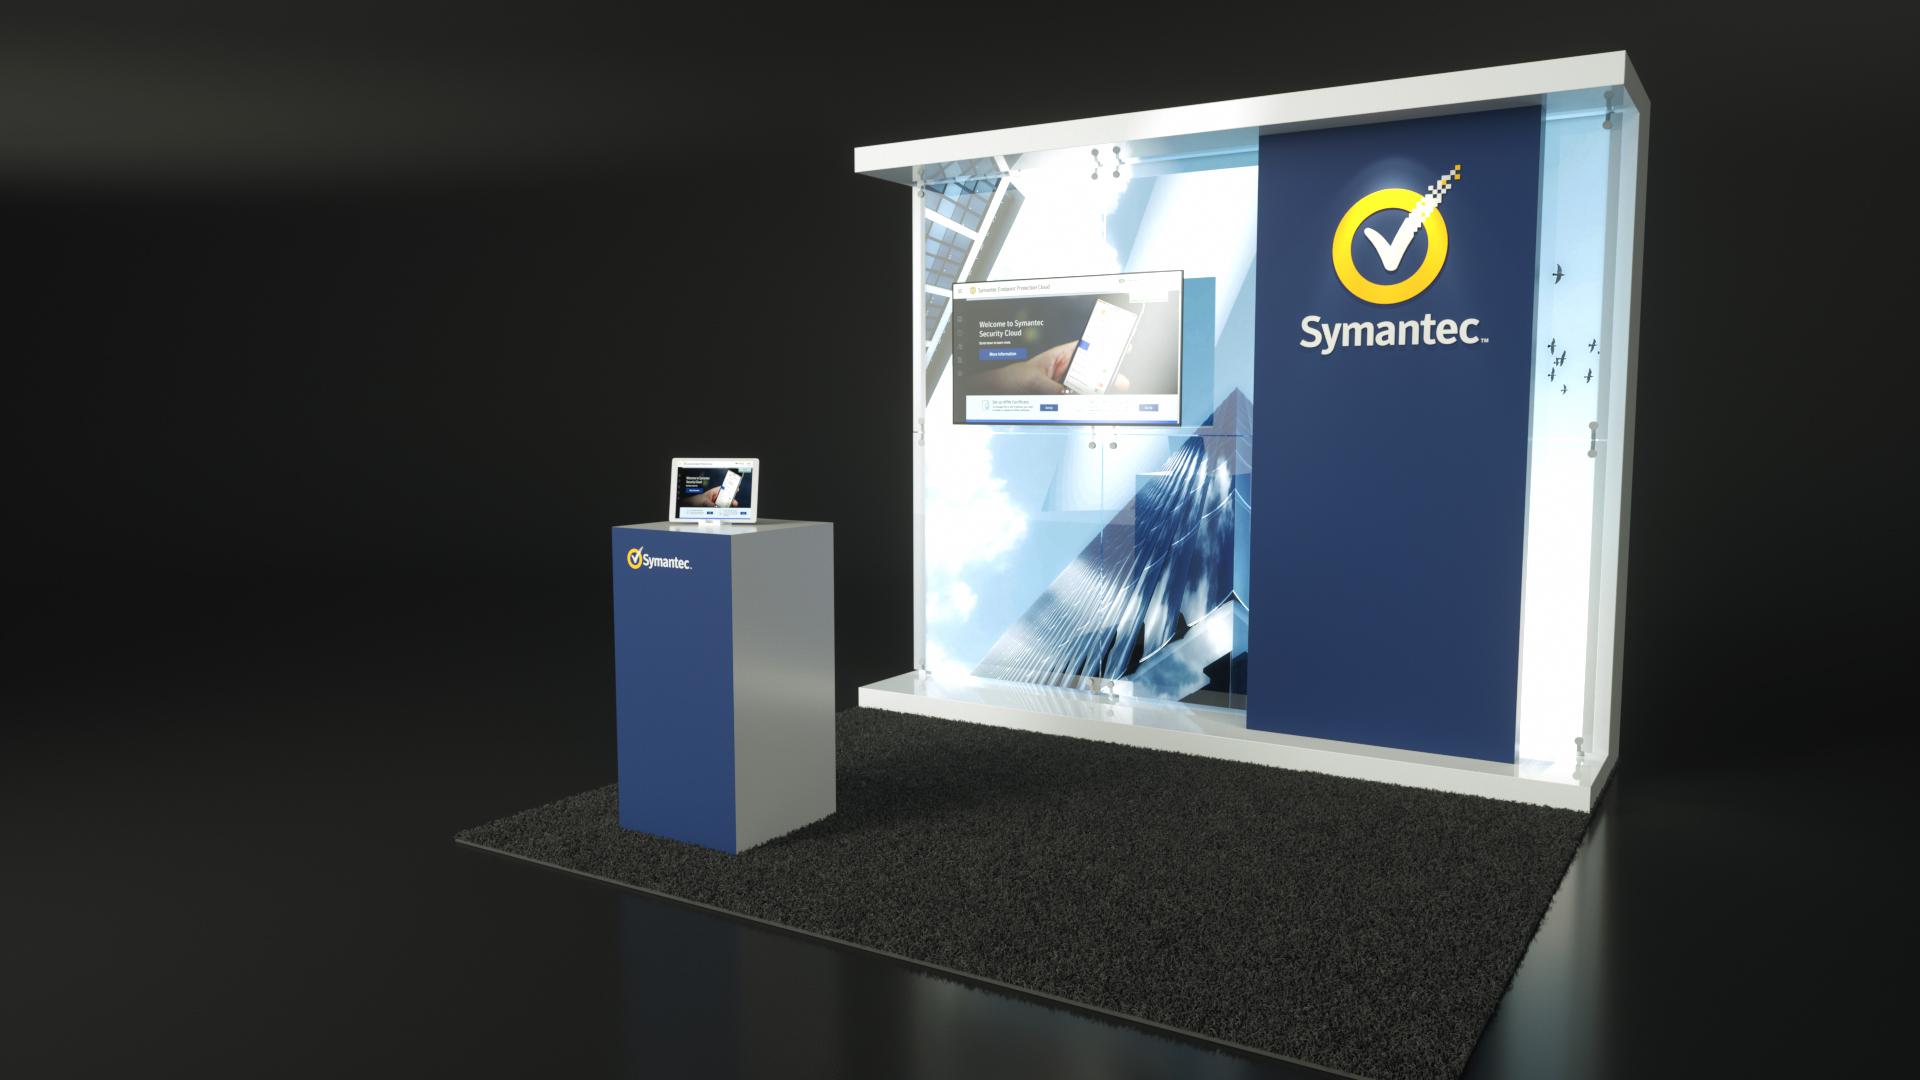 3417 - Symantec Canada - SecTor 2018 - View 1.jpg